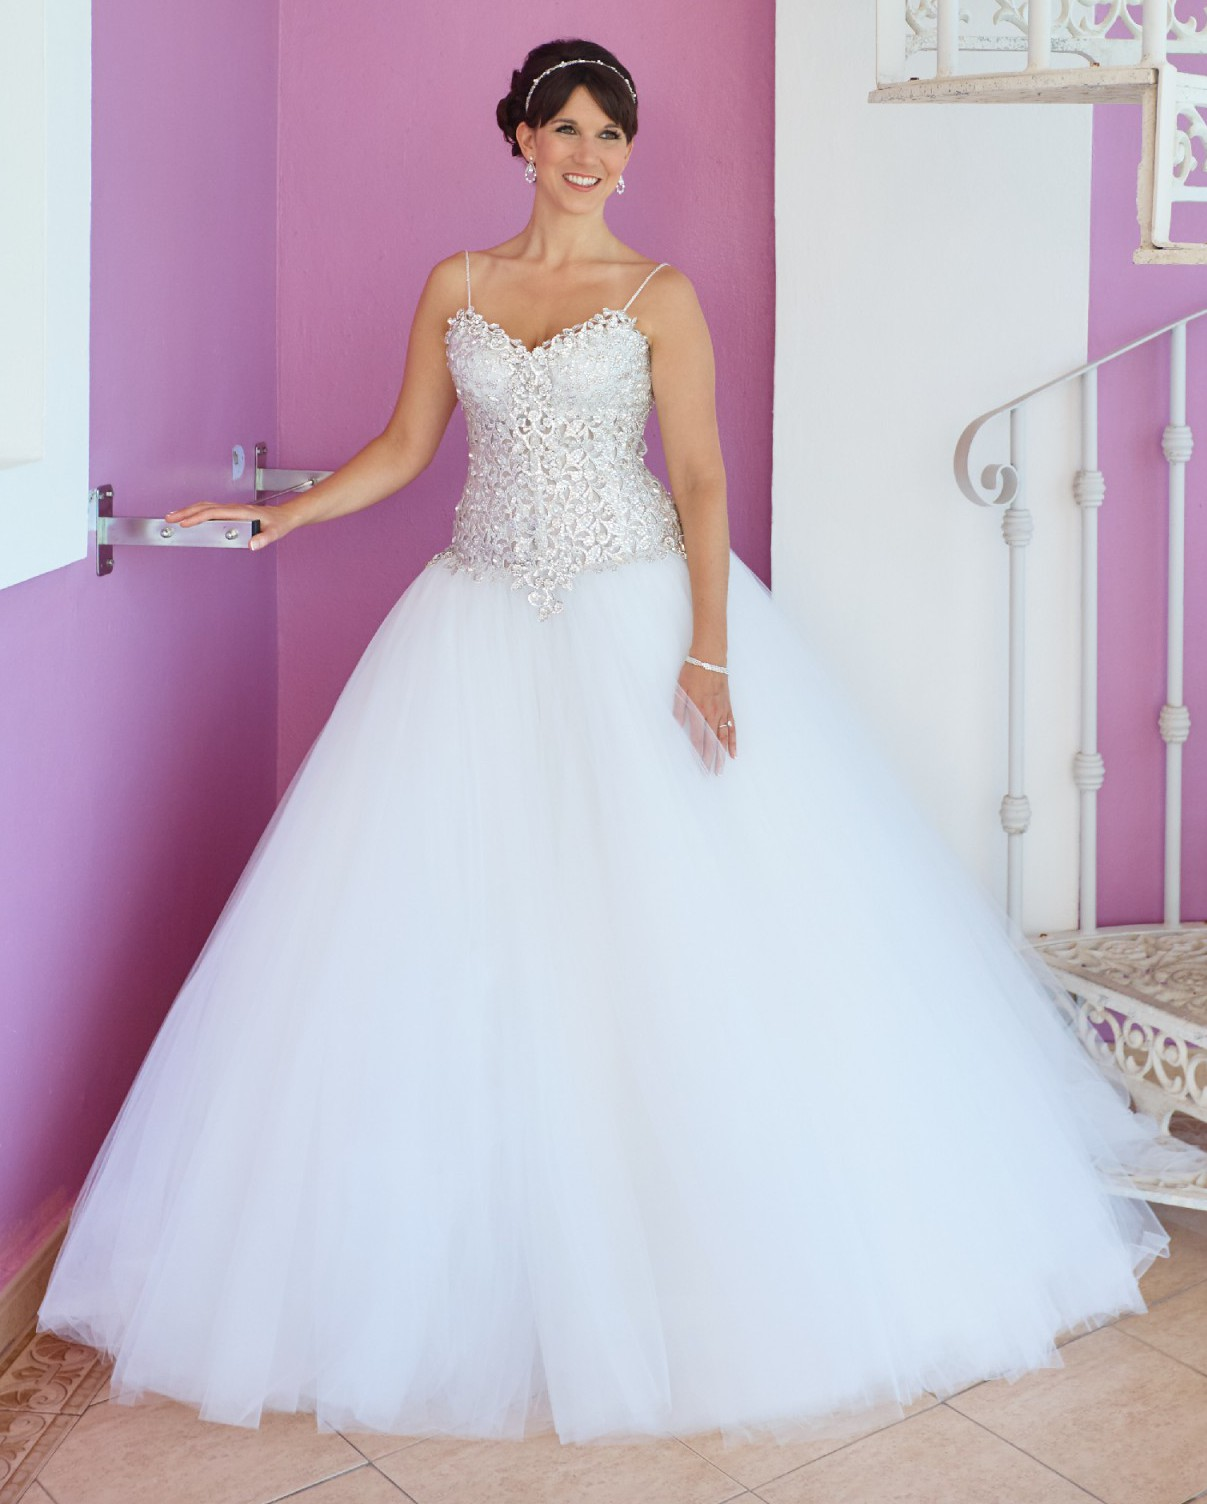 Pnina Tornai 4385 Used Wedding Dress On Sale 54% Off